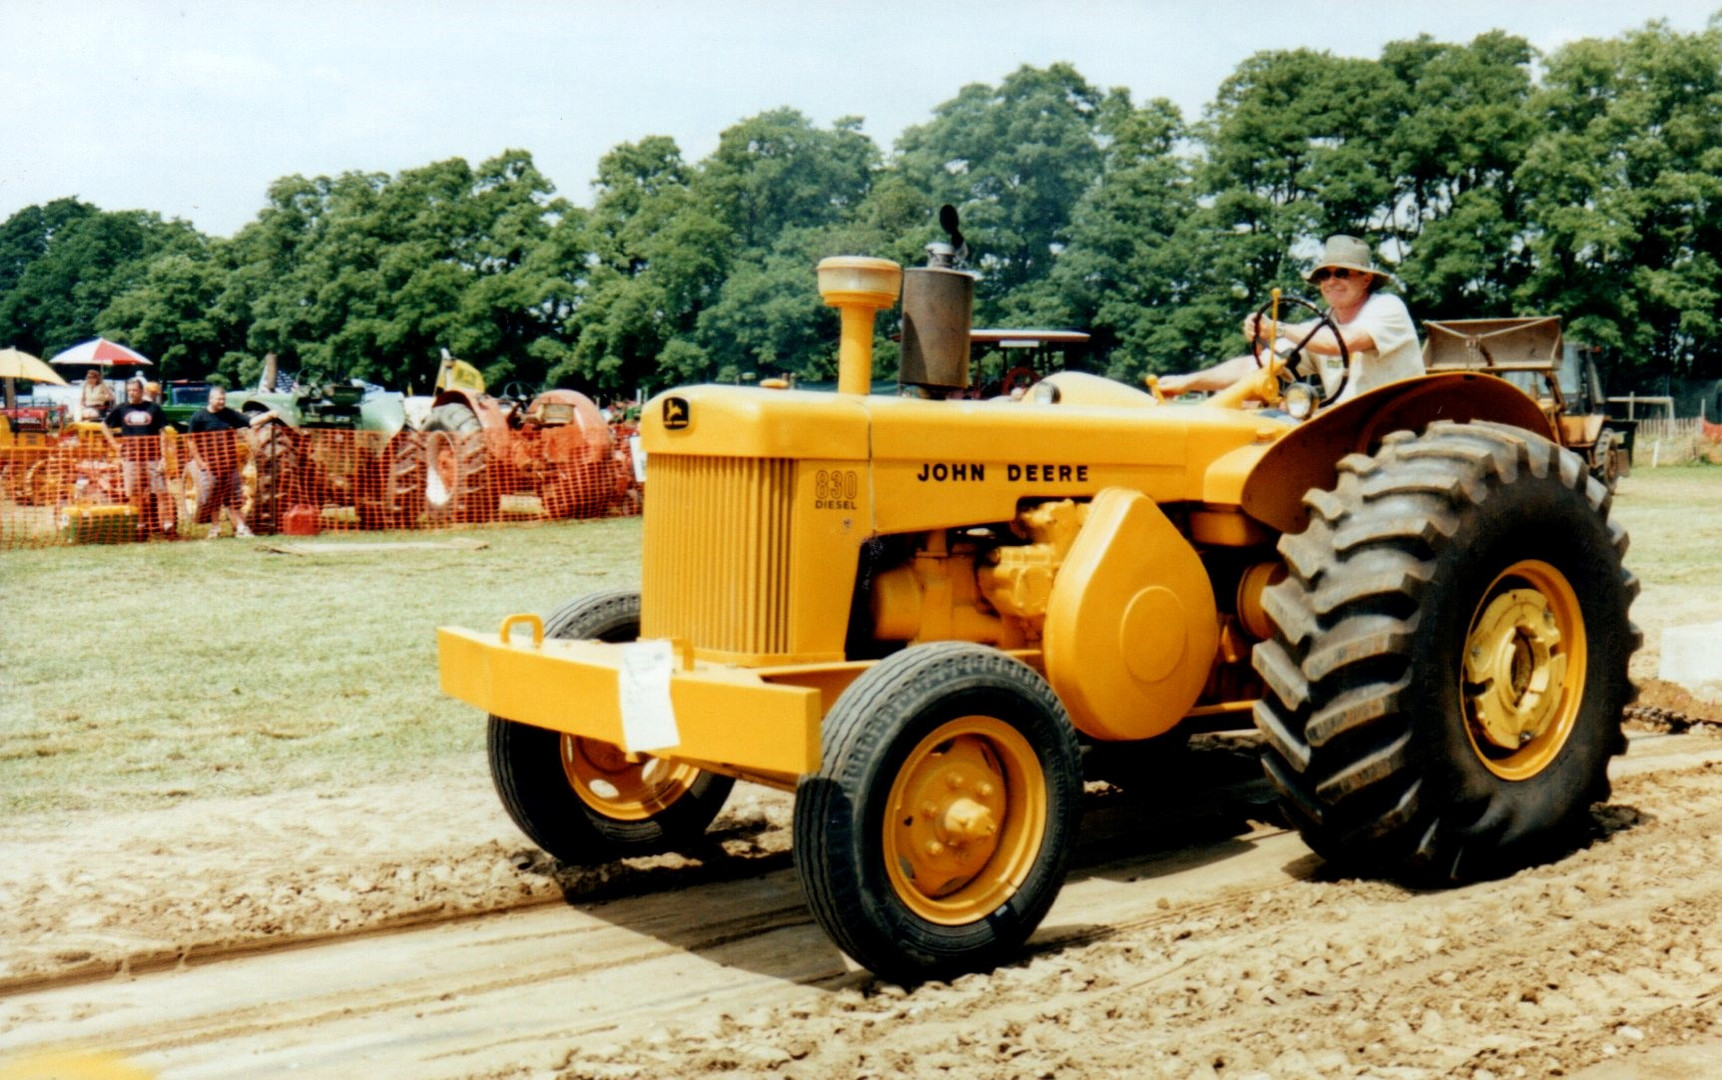 John Deere Industrial tractor on pulling track